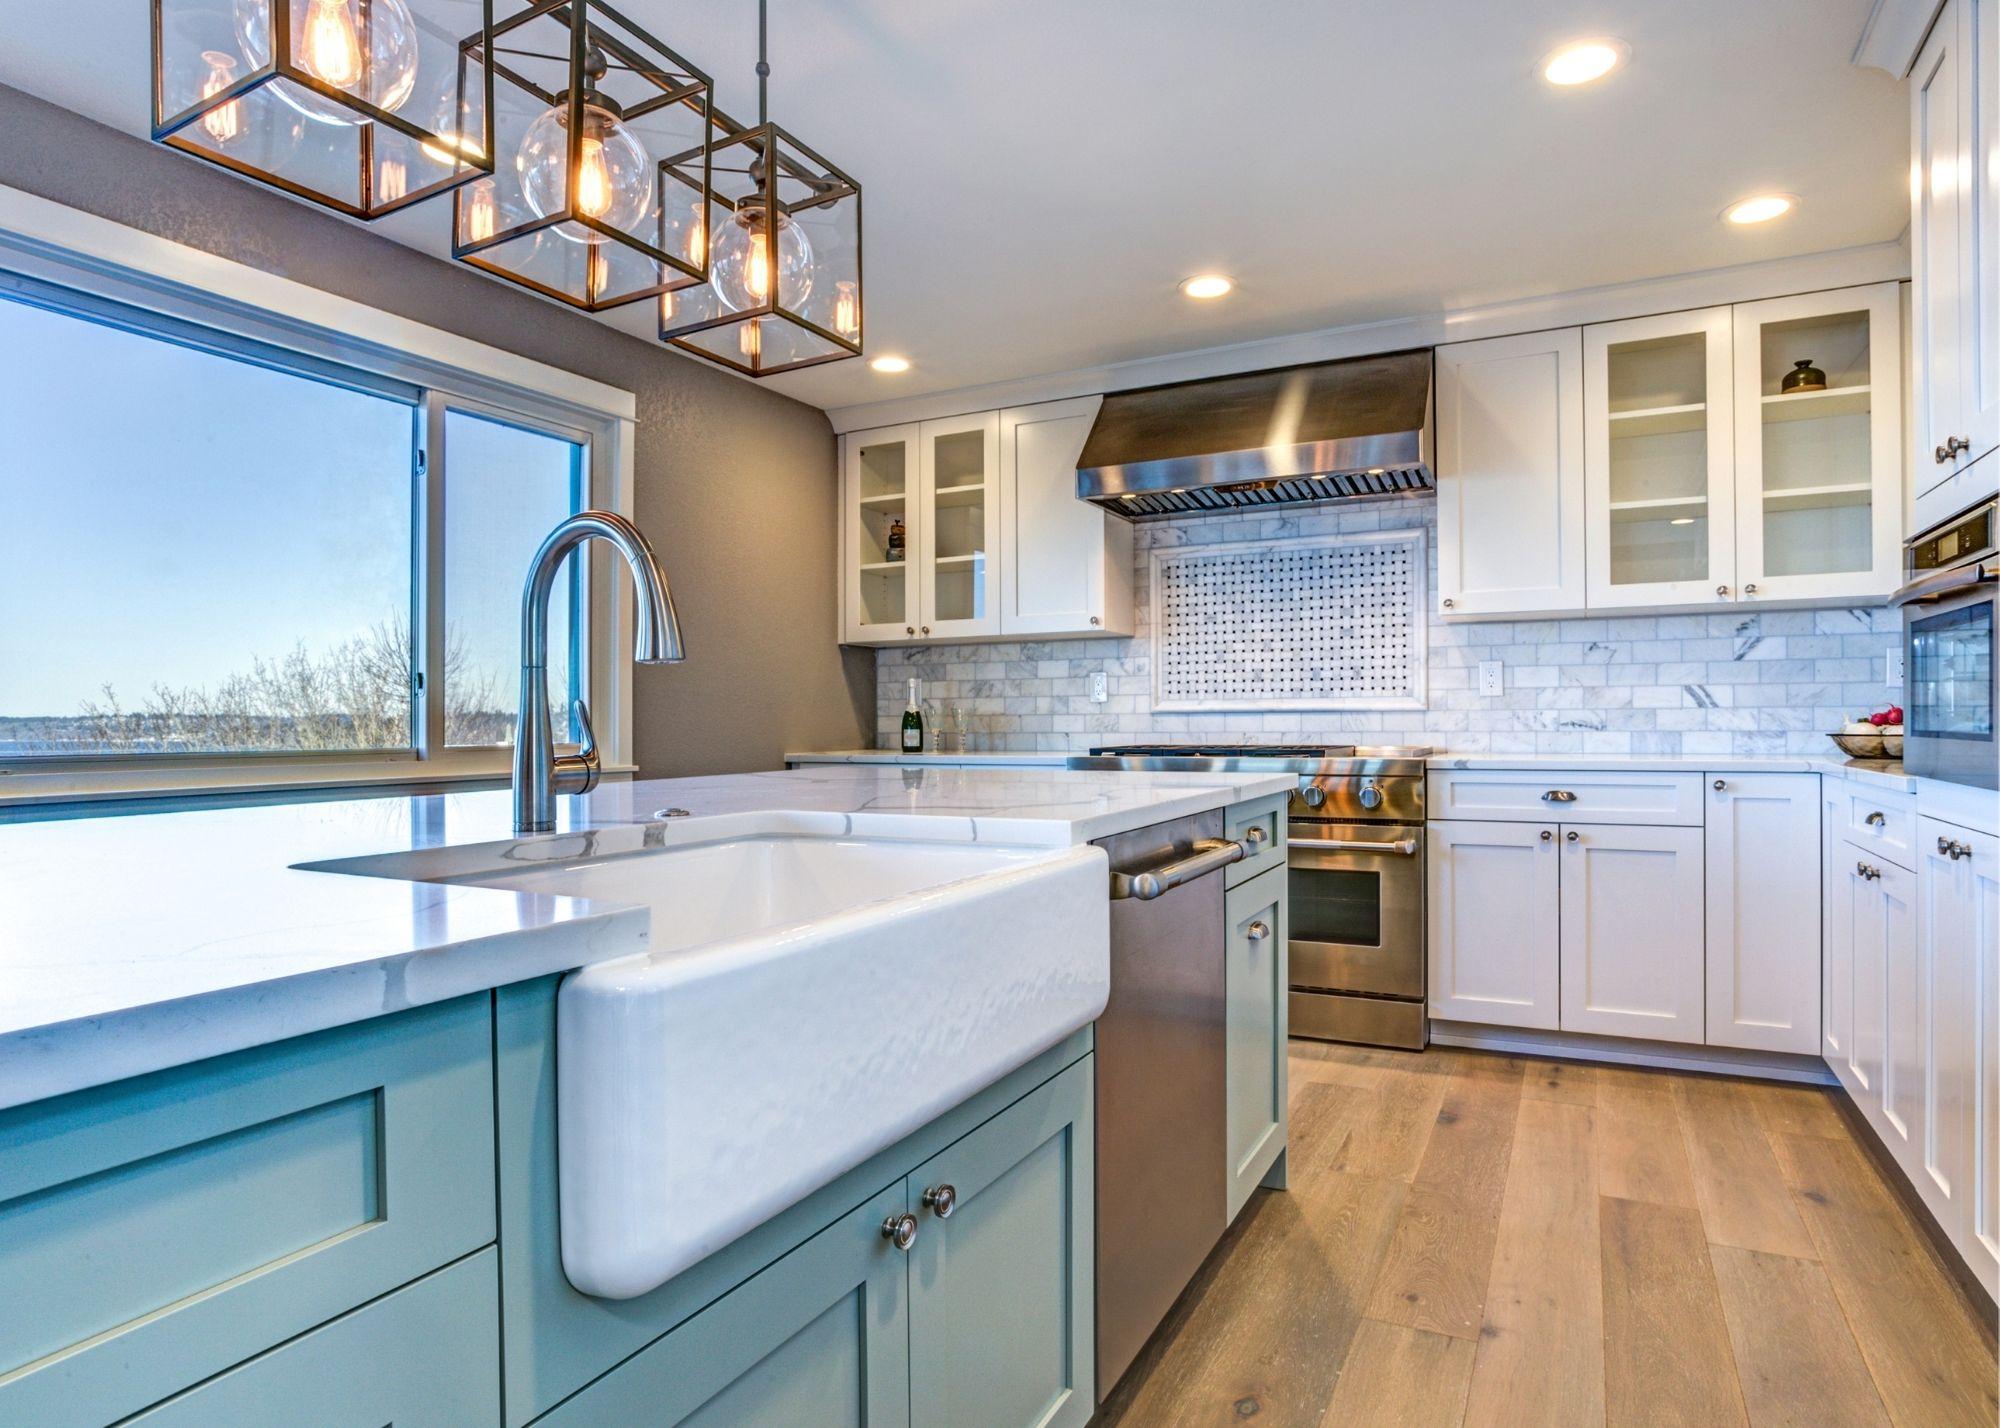 kitchen-renovation-cost-toledo-ohio